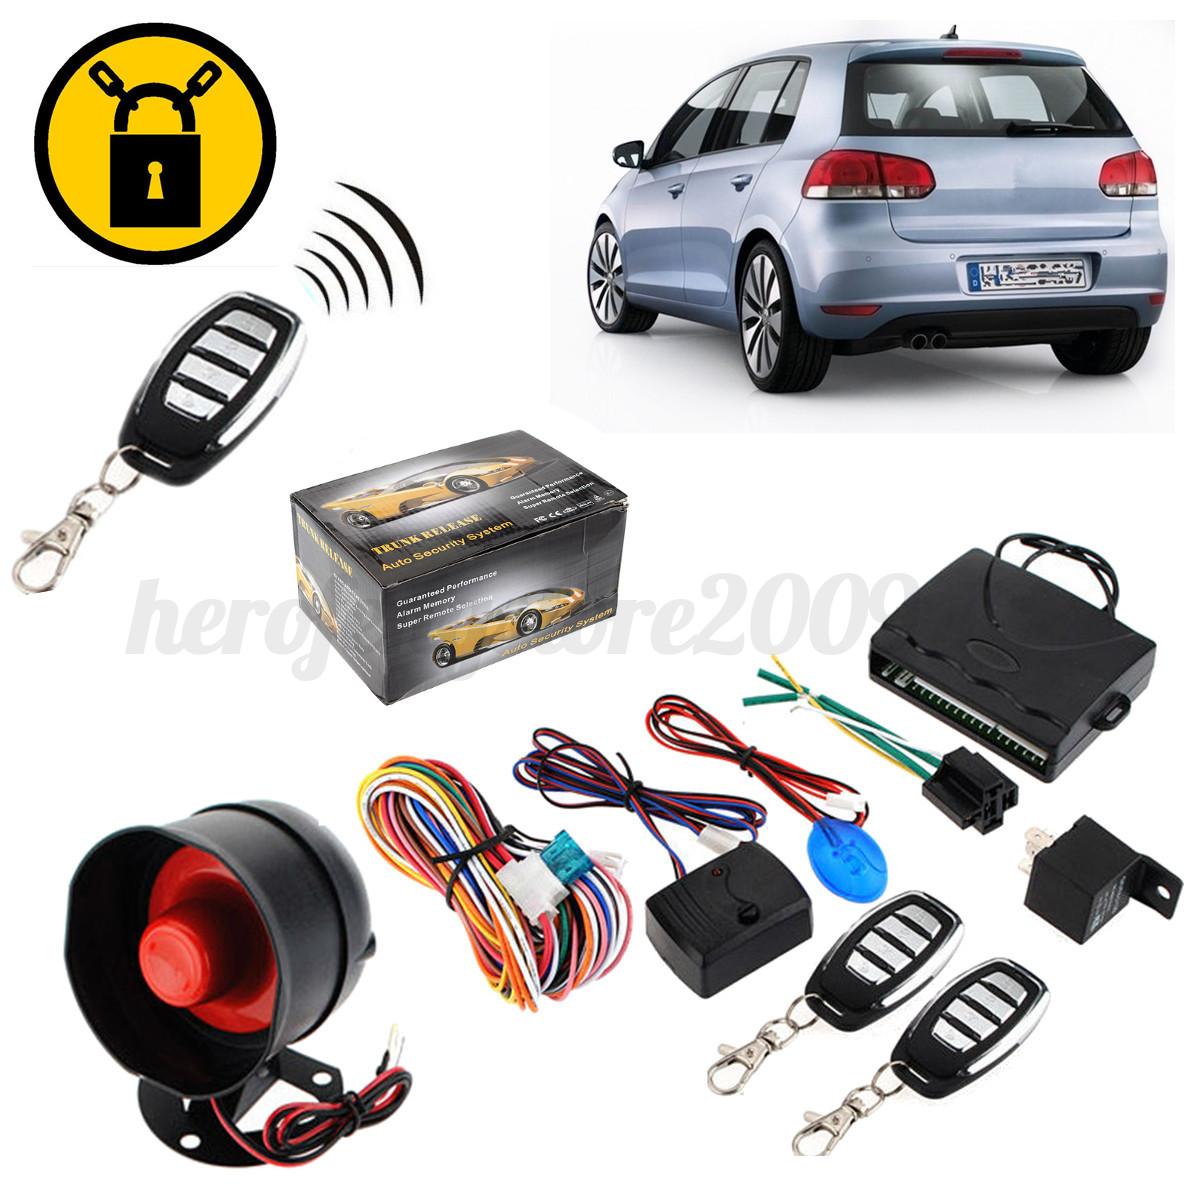 2 Remote One Way Car Engine Auto Alarm System Keyless Entry Central ...